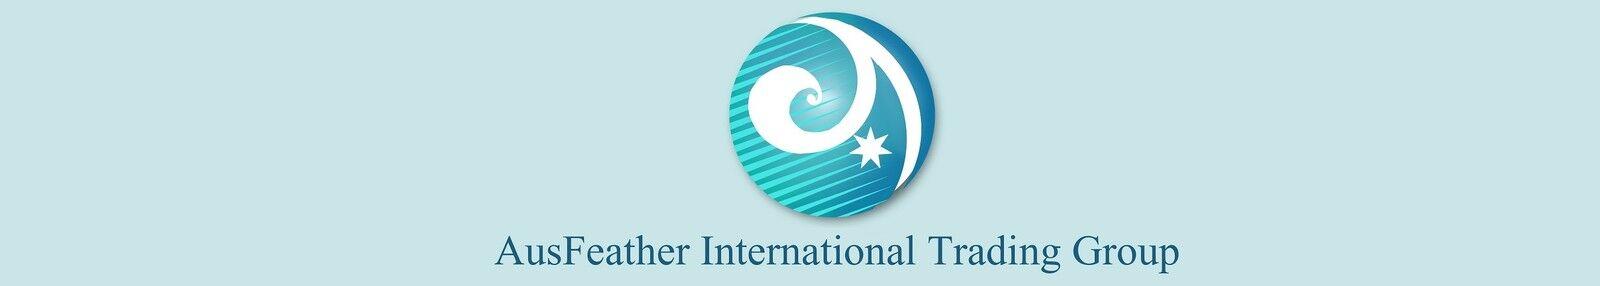 Ausfeather International